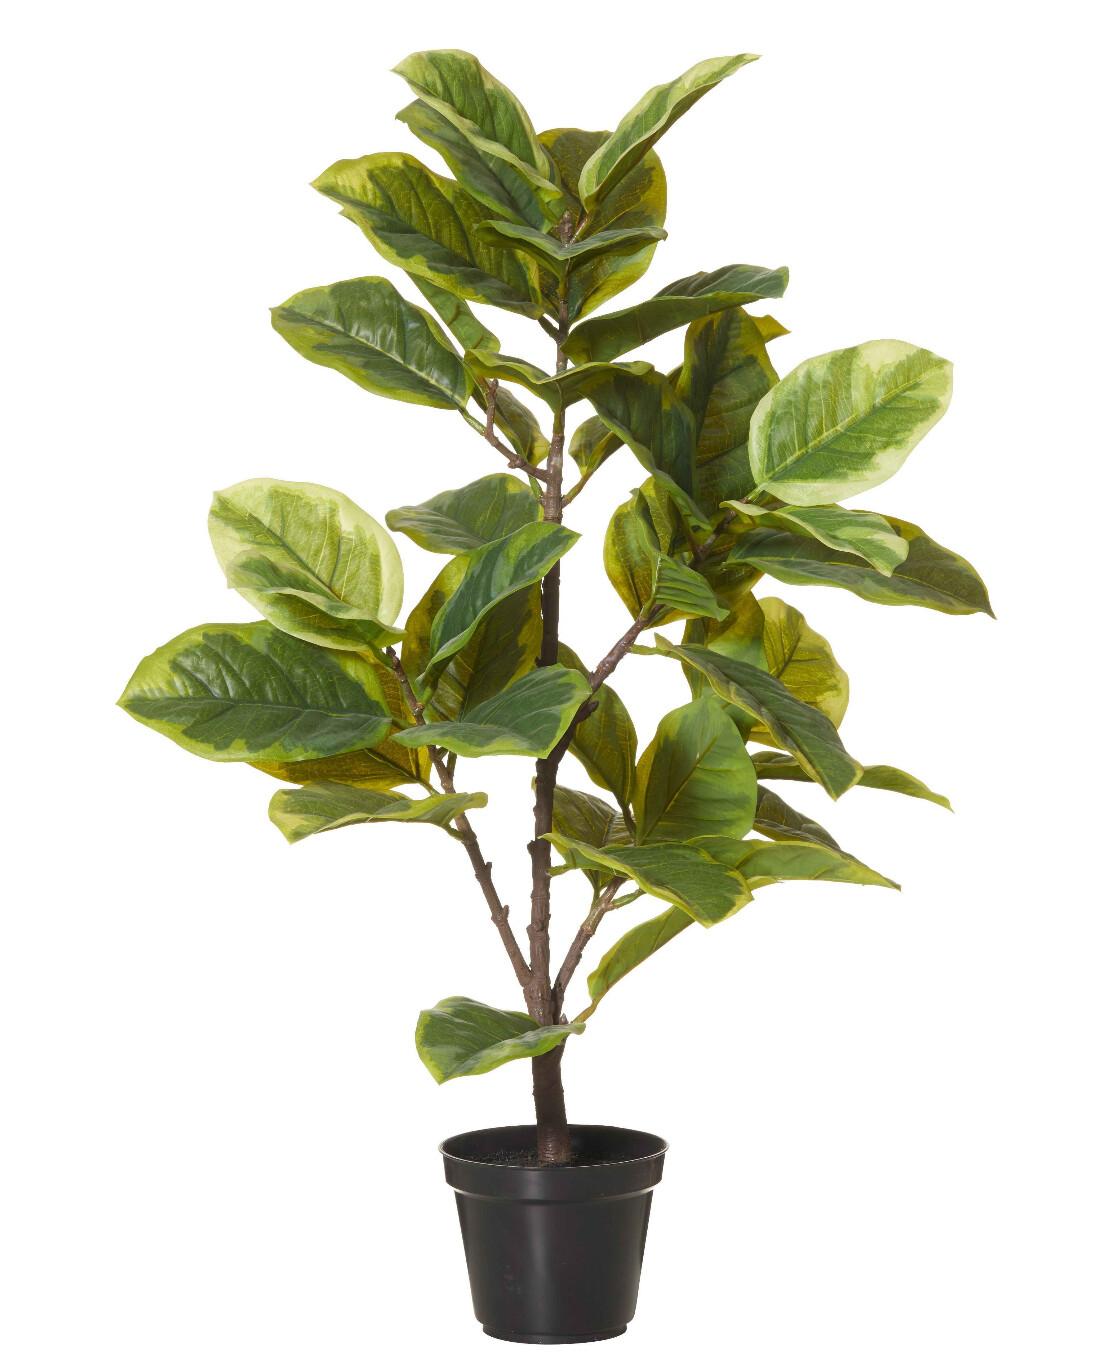 TURTLE SHELL PLANT